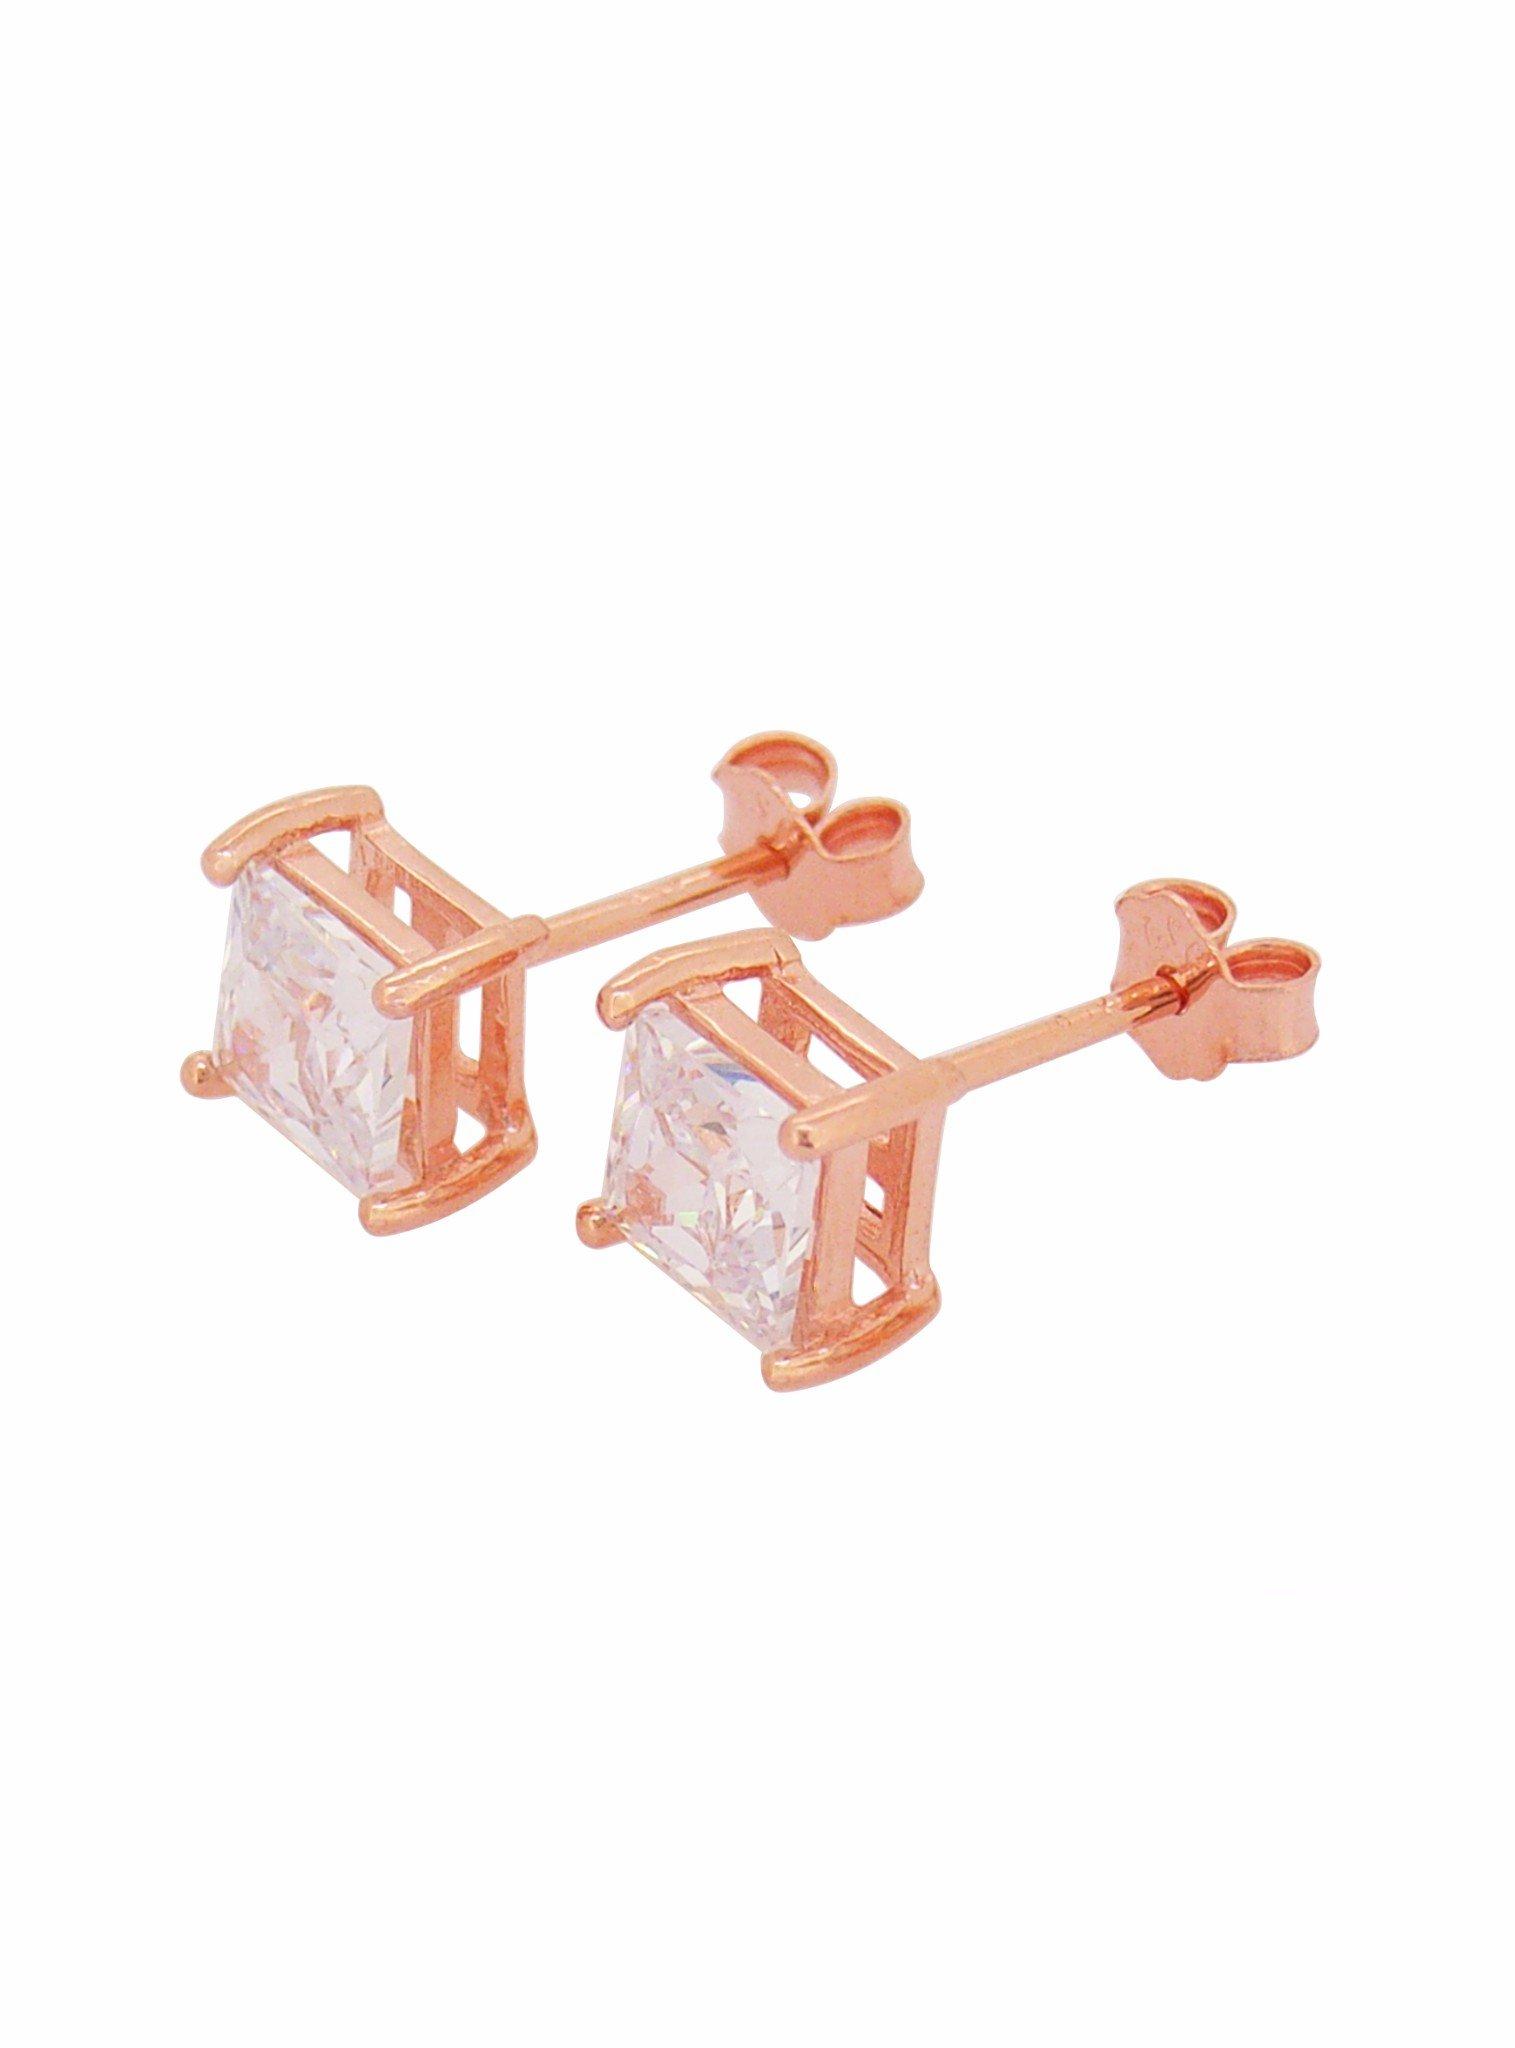 Aaliyah Princess CZ Earrings in Rose Gold